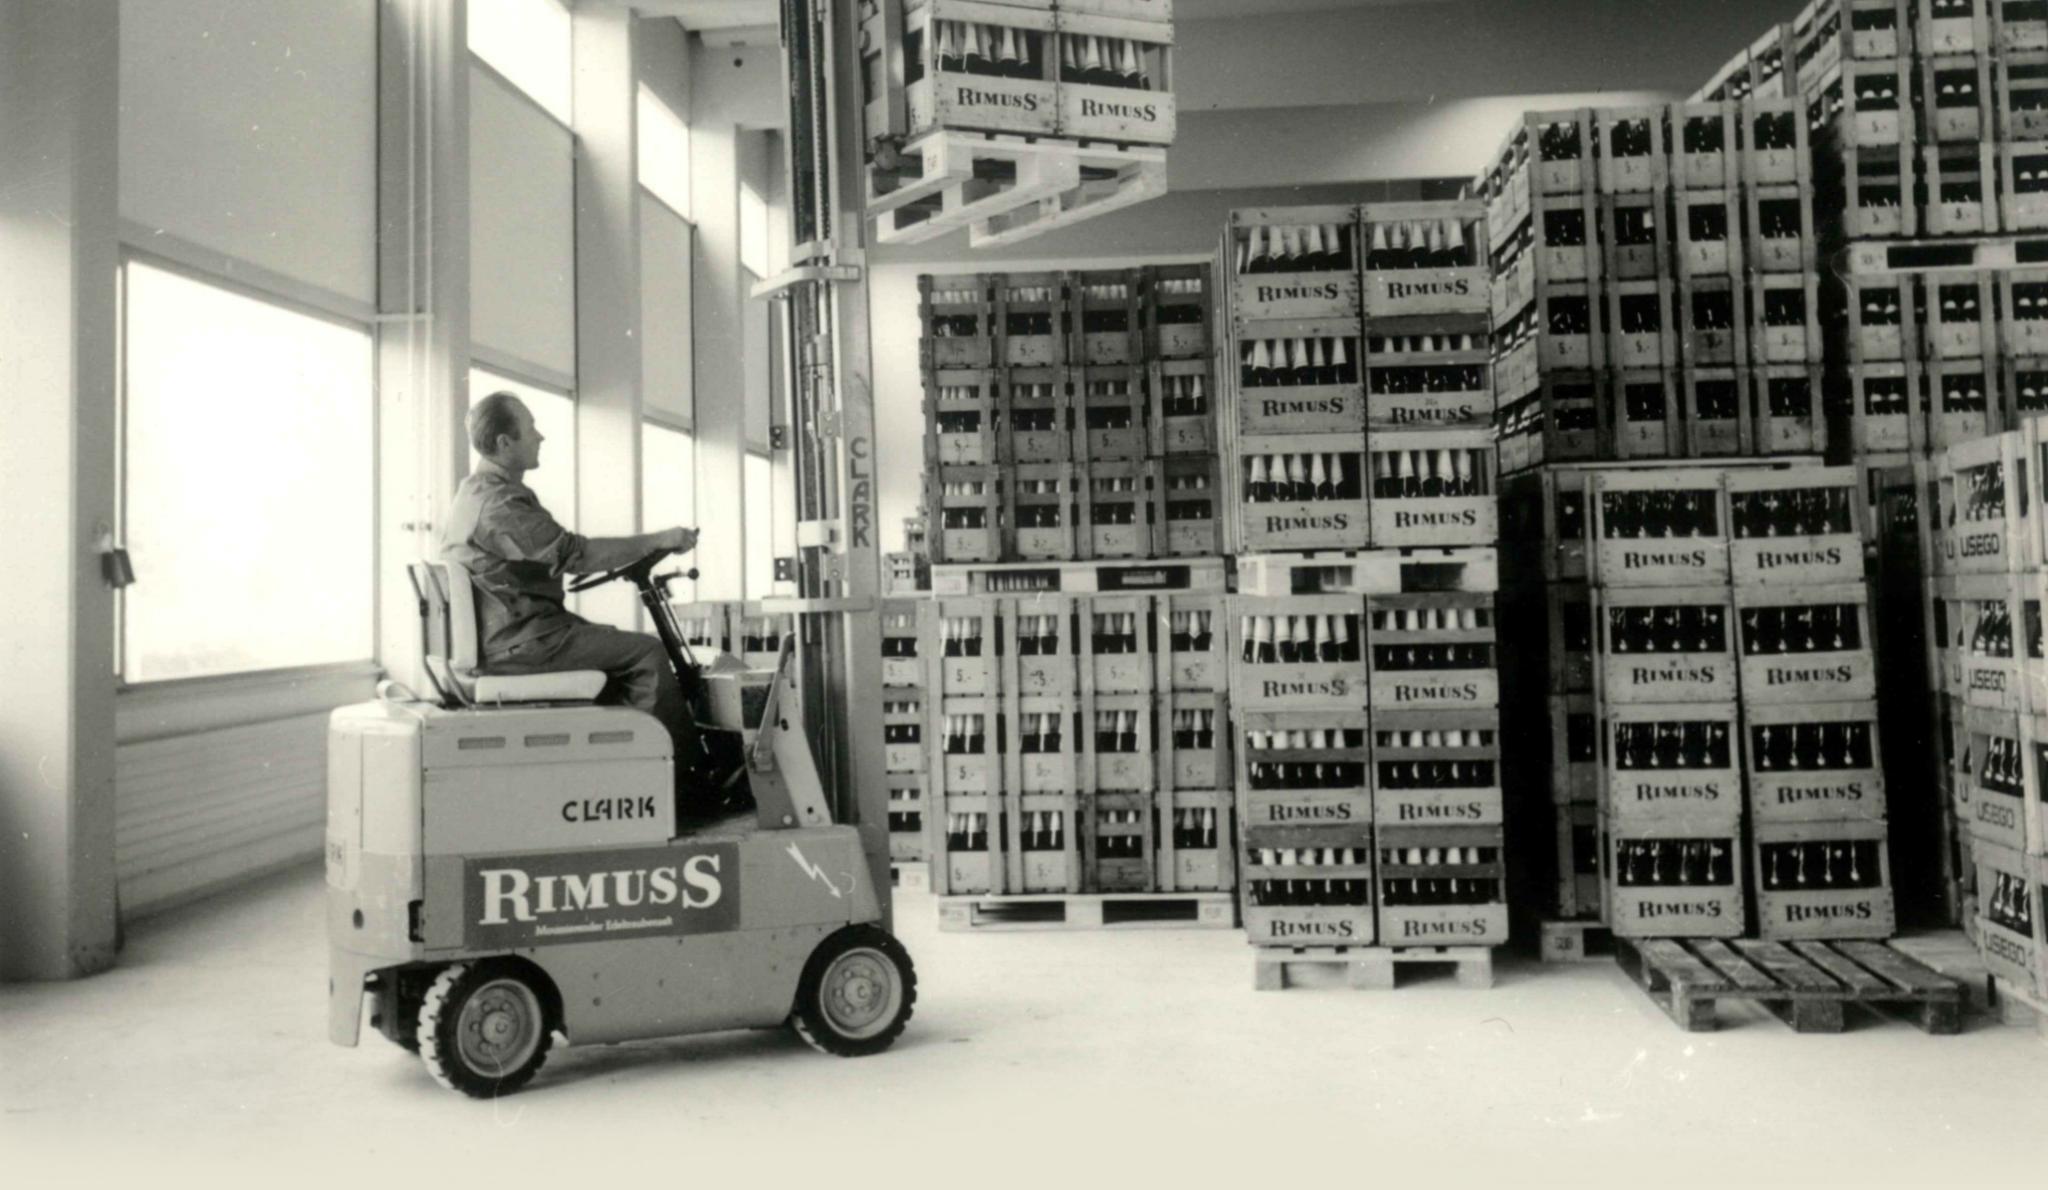 Archivbild von Rimuss mit altem Gabelstapler und Gabelstapler Fahrer im Lager von Rimuss